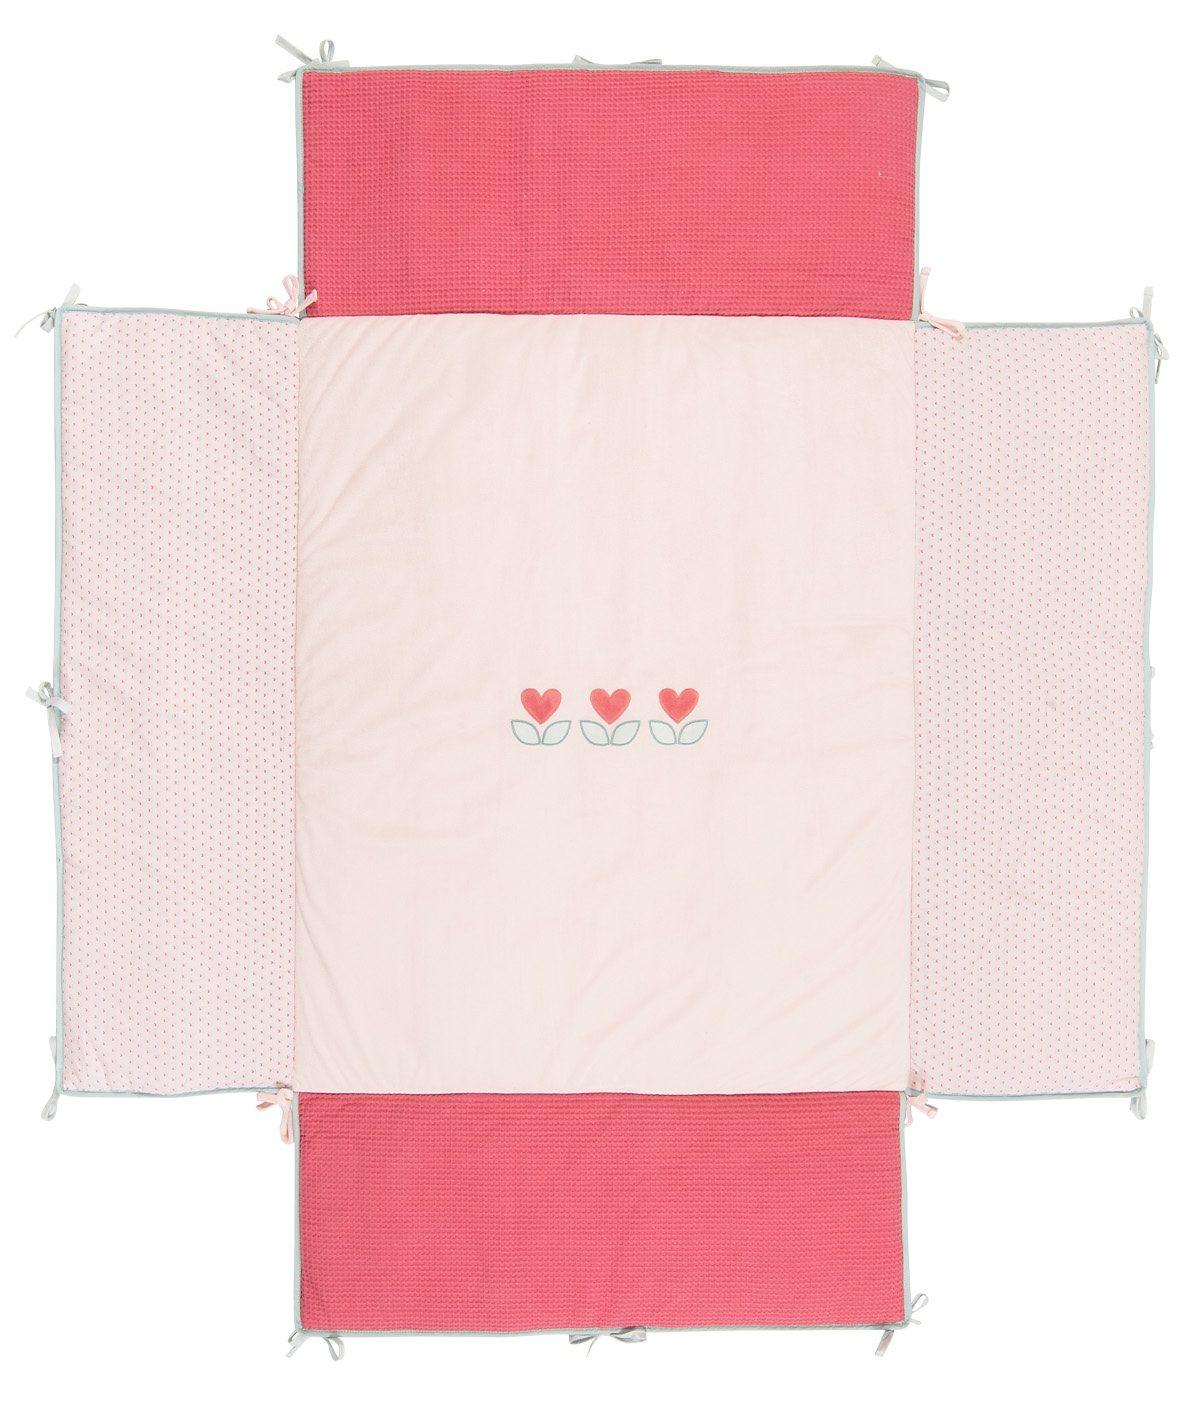 NATTOU Laufgittereinlage, 95x75 cm rosa